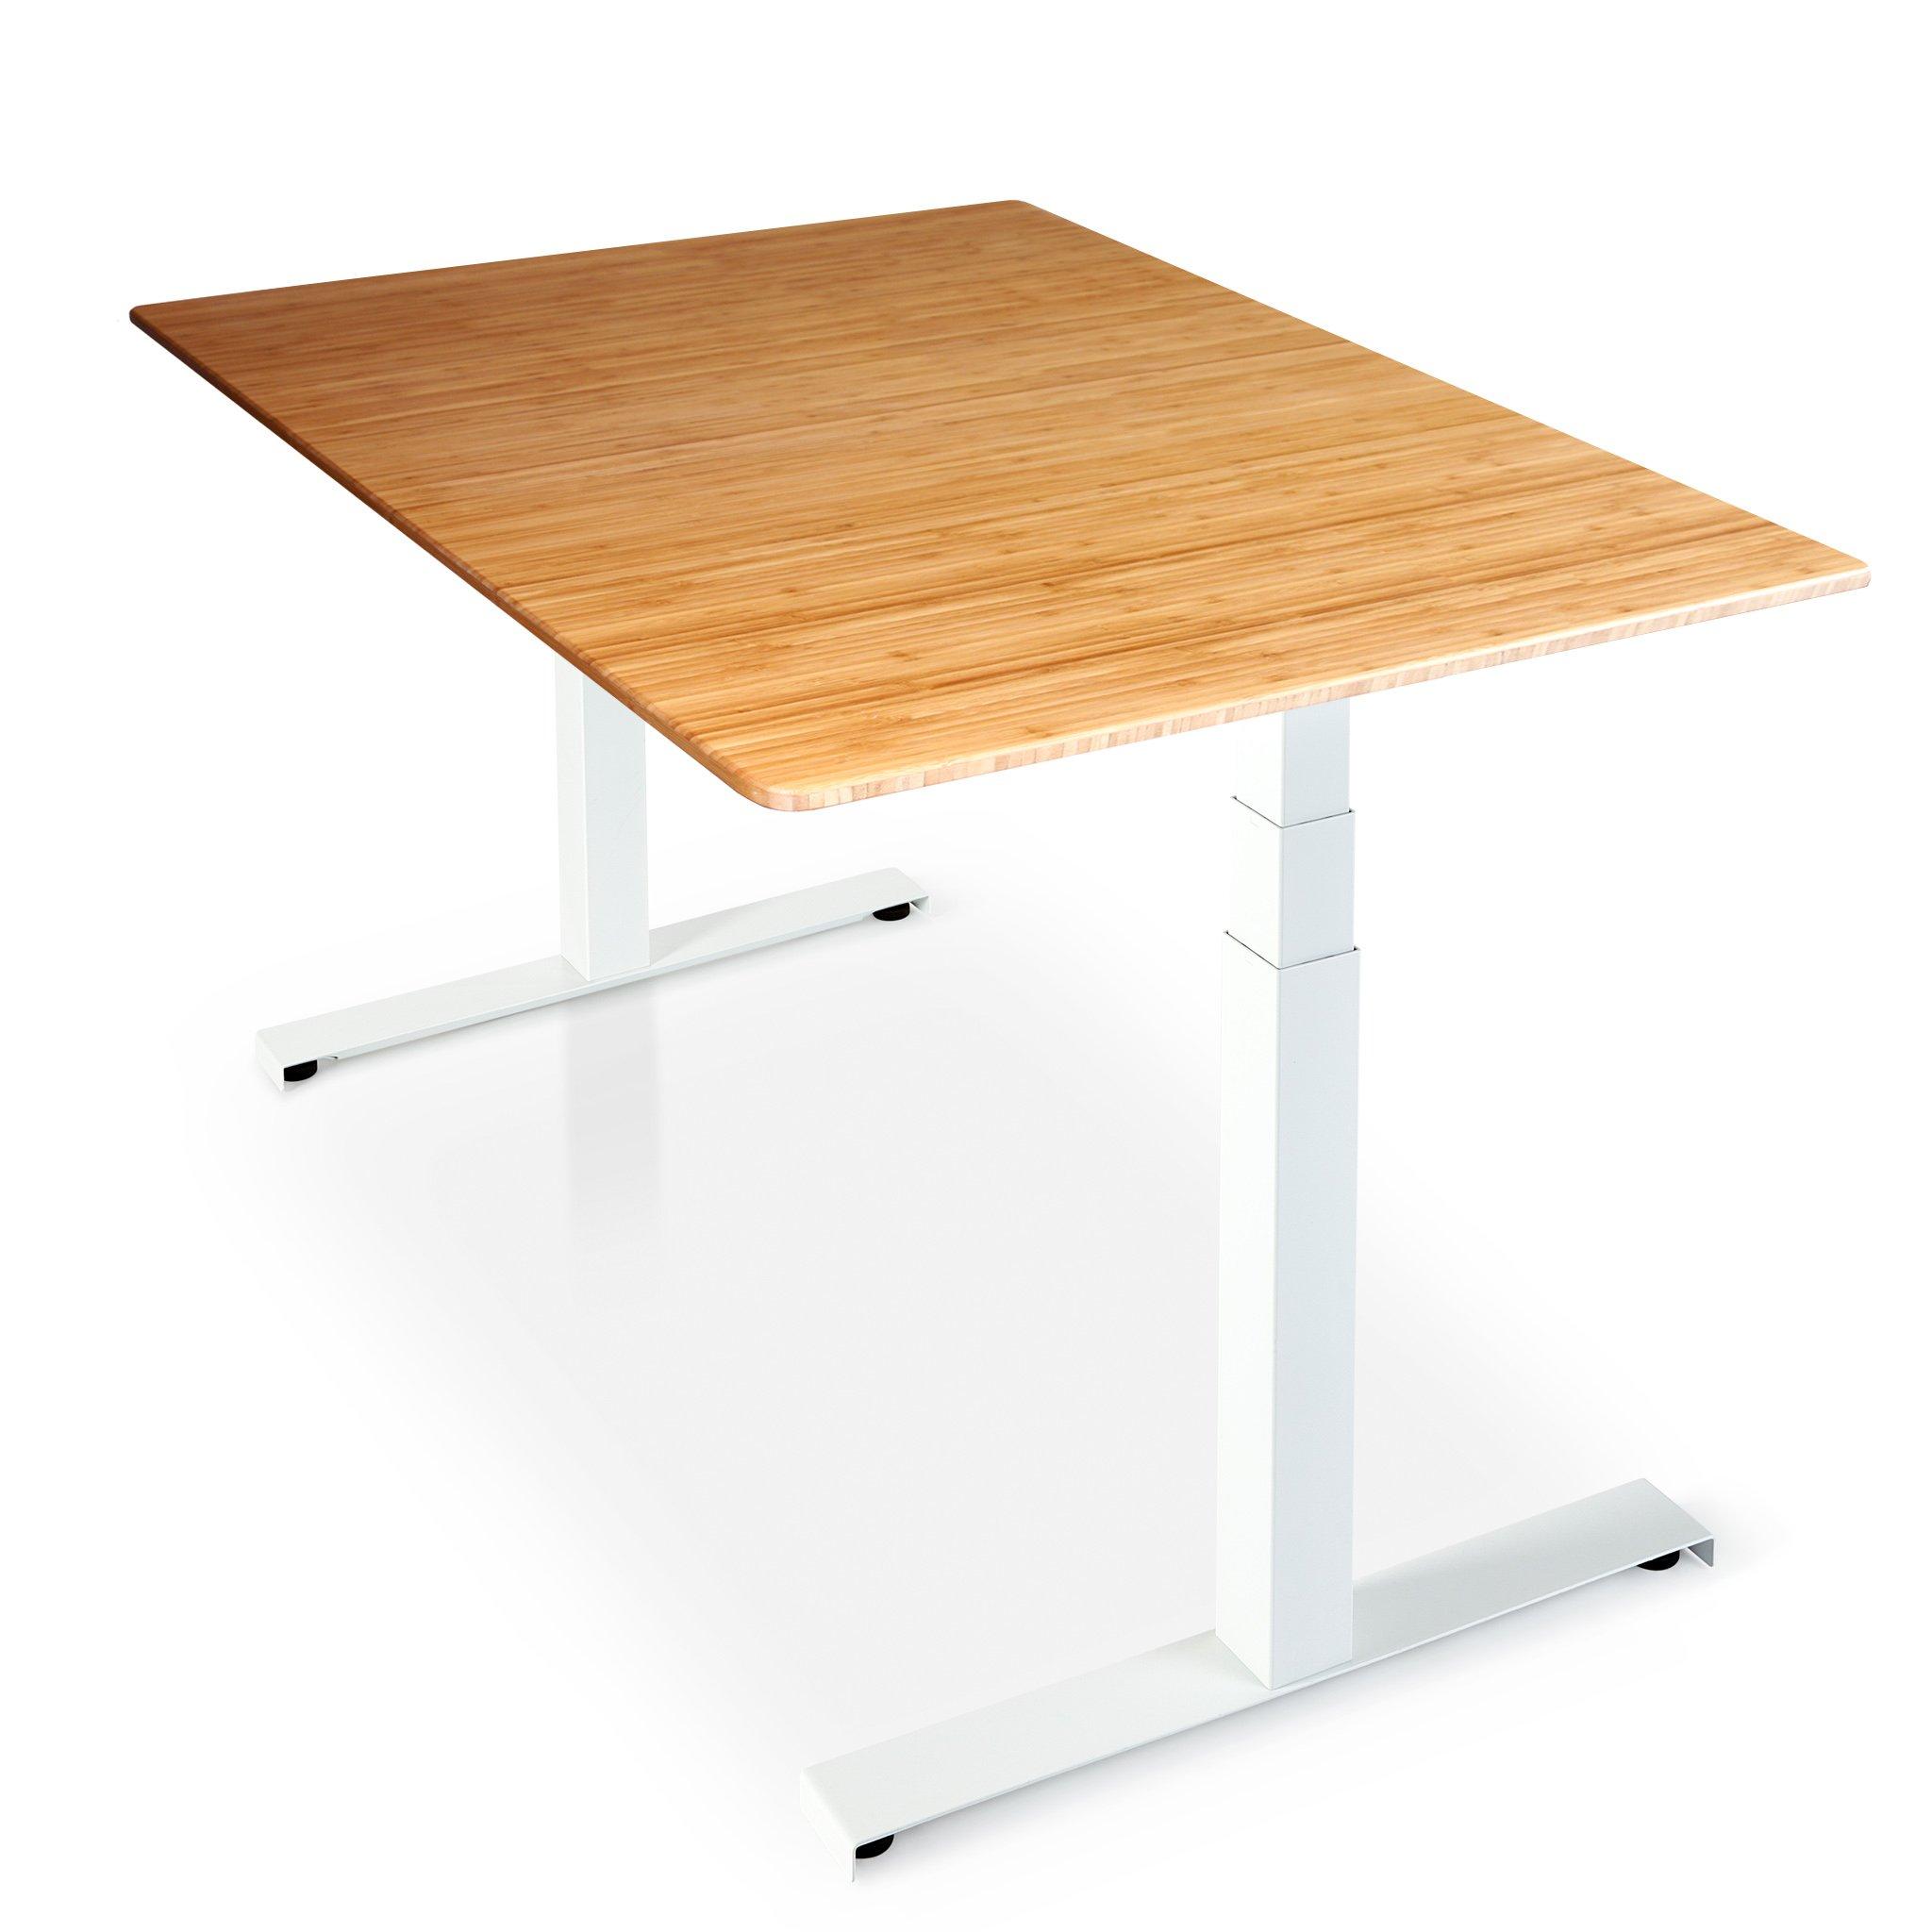 Sisu Bamboo Standing Desk with white frame